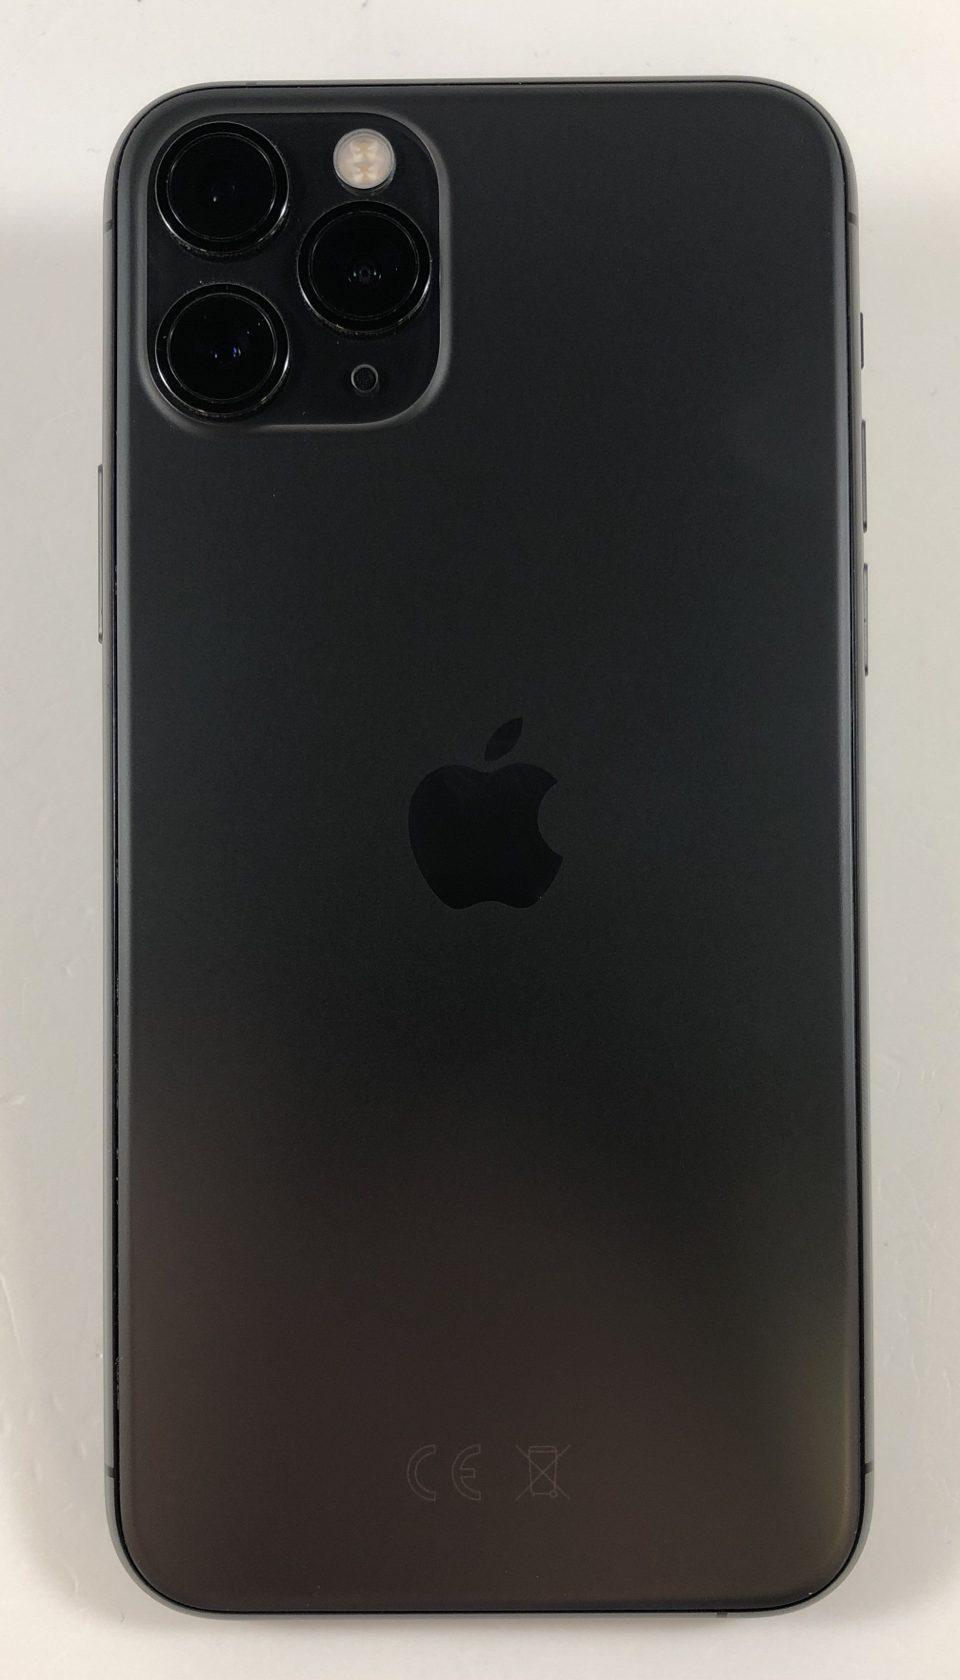 iPhone 11 Pro 256GB, 256GB, Space Gray, obraz 3